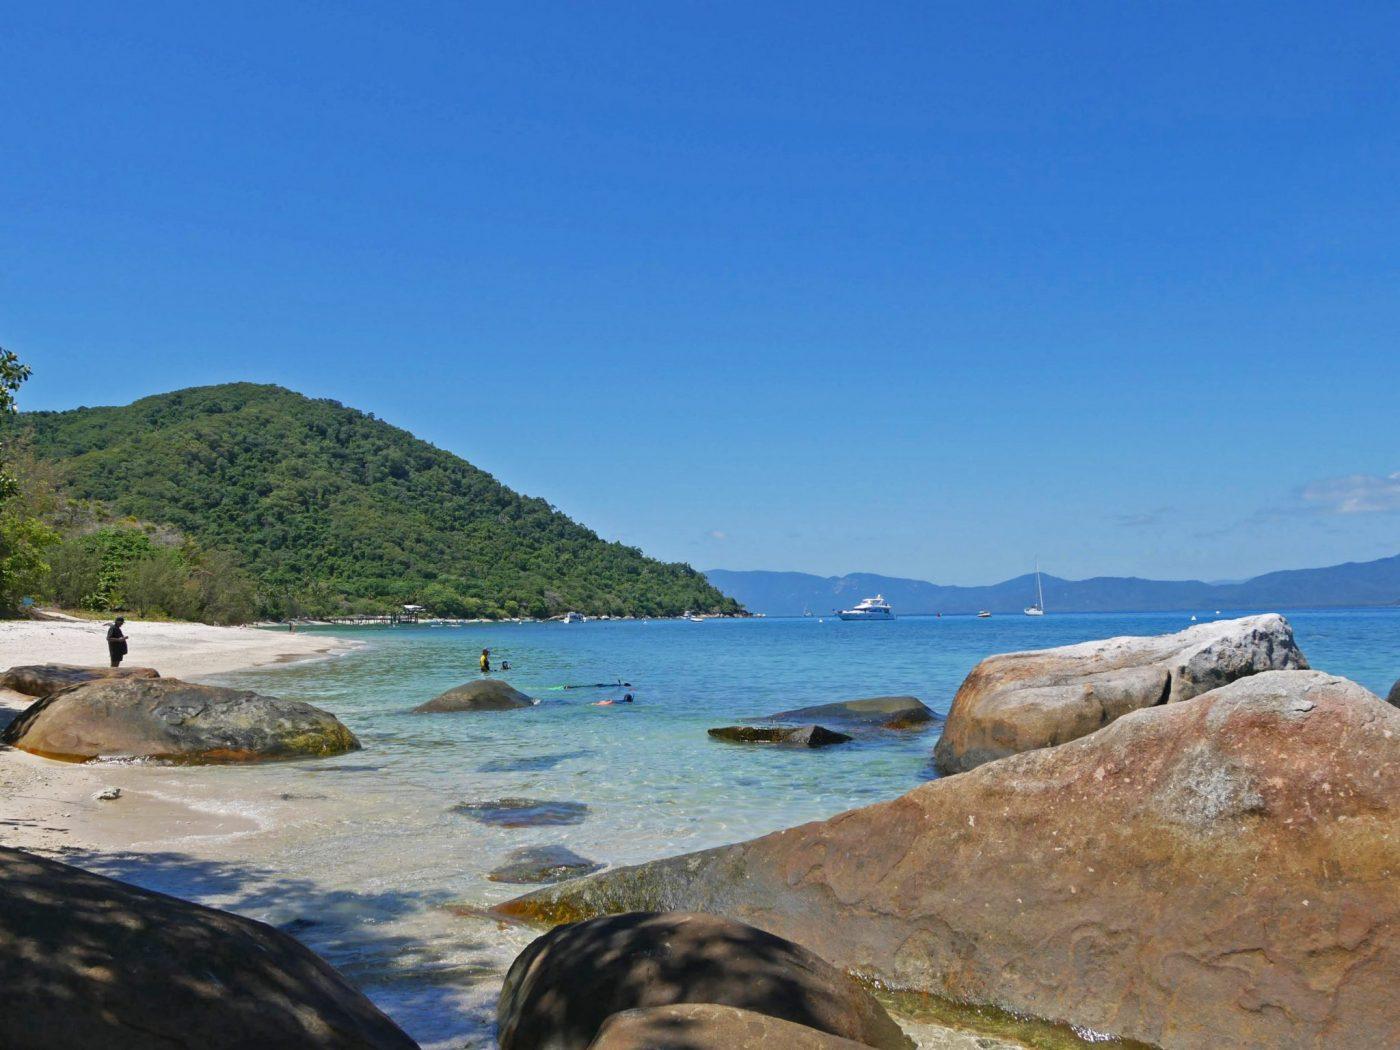 Snorkeling among the rocks